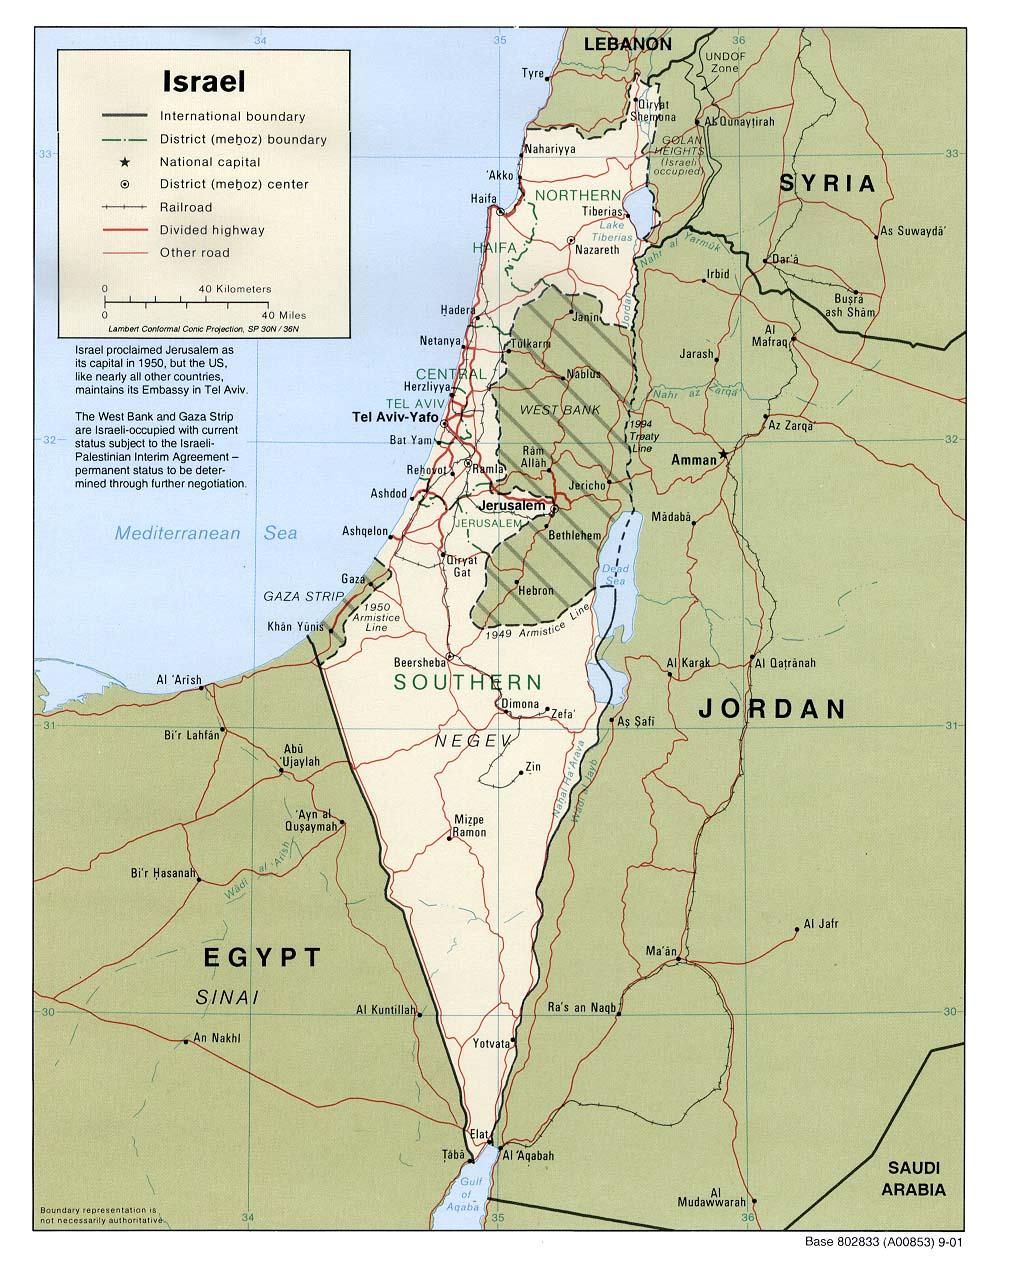 Cartina Israele Giordania.Mappa Israele 1 020 X 1 278 Pixel 225 51 Kb Pubblico Dominio Freemapviewer